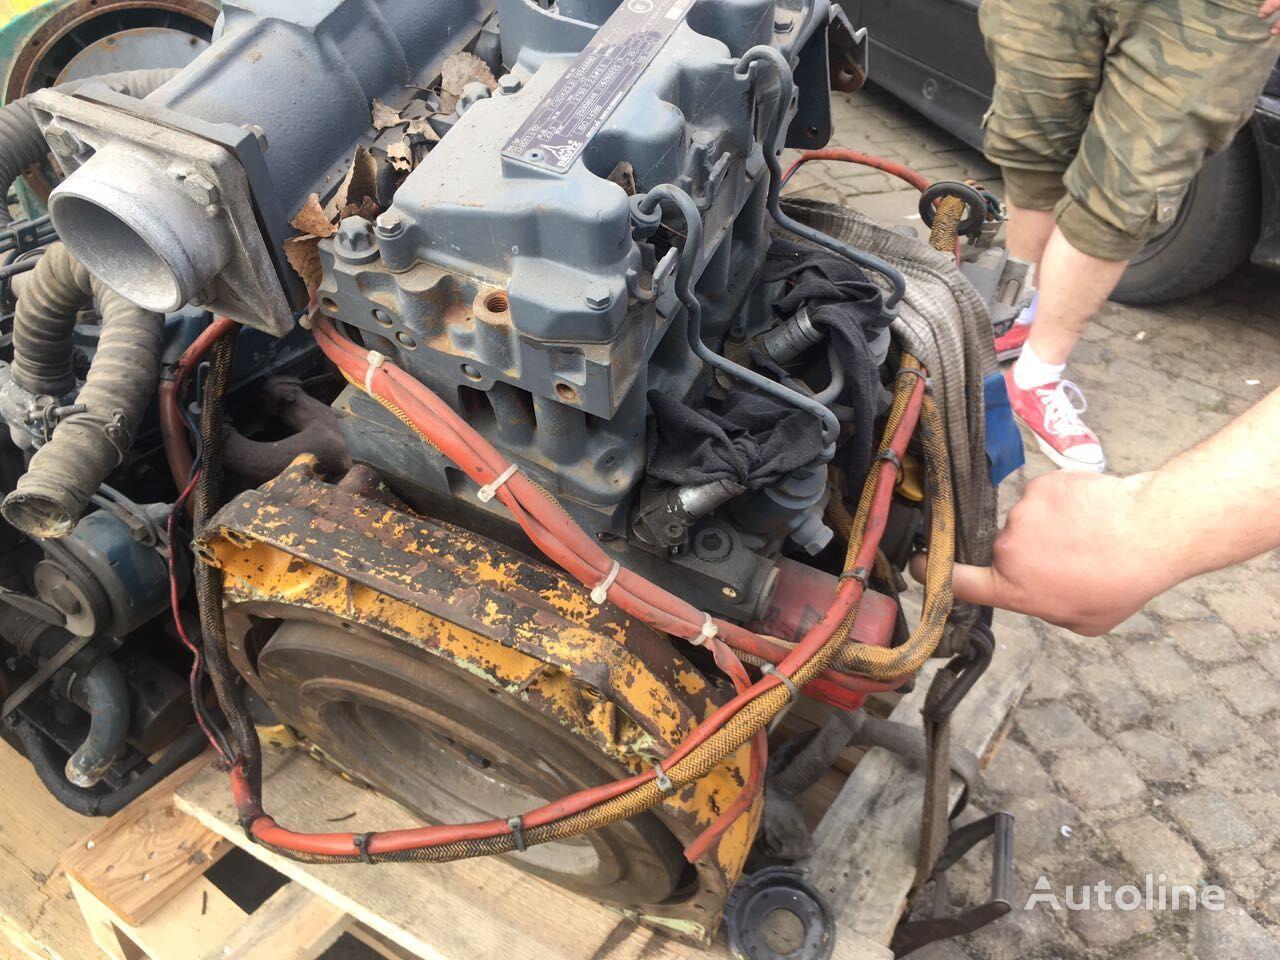 DEUTZ D2011L02 (DEUTZ D2011L02) engine for wheel loader